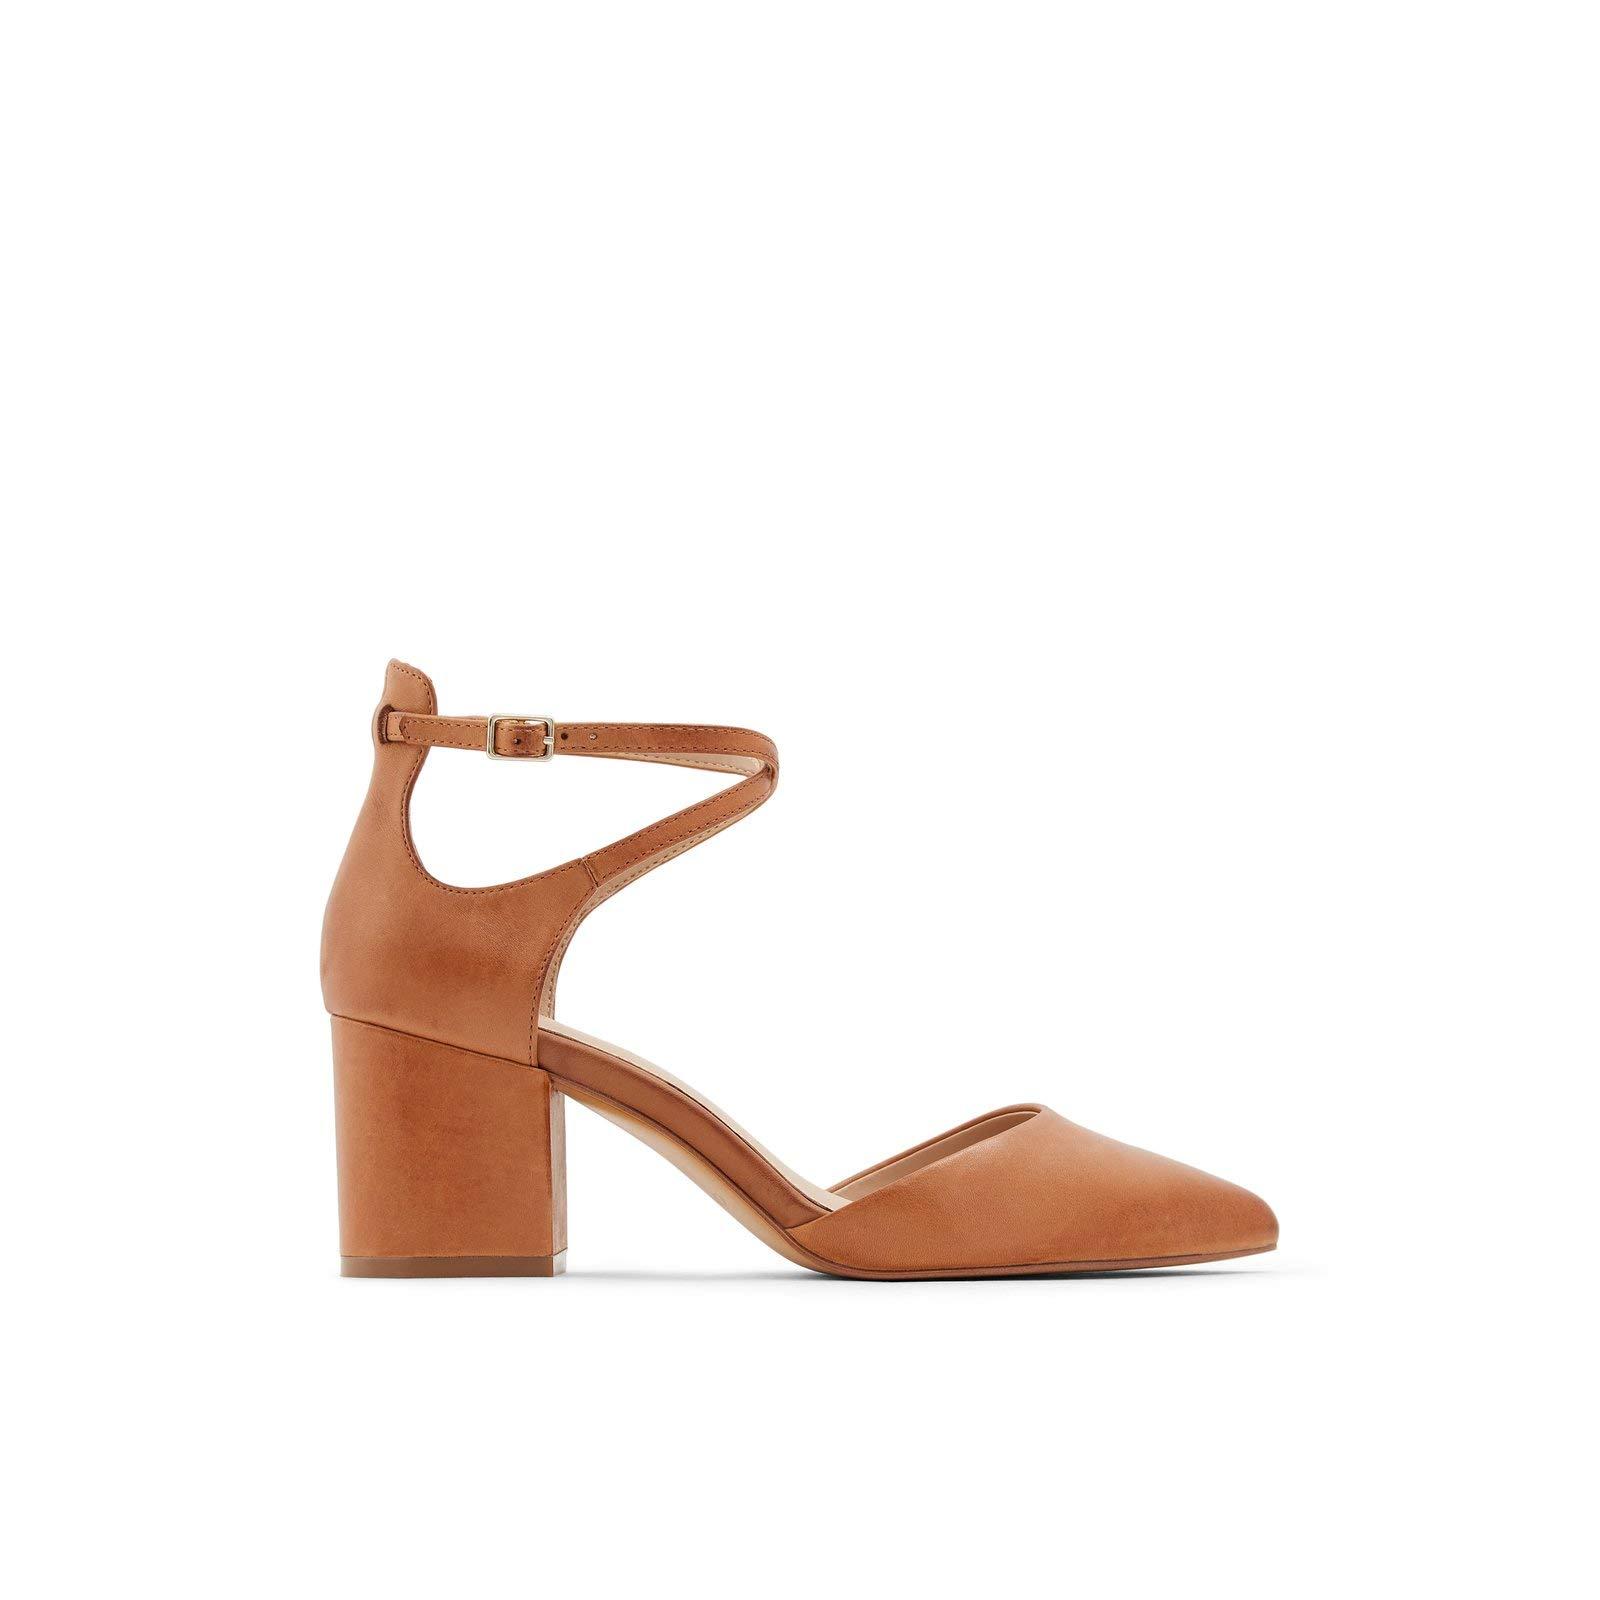 ویکالا · خرید  اصل اورجینال · خرید از آمازون · ALDO Women's Block Heel Pump, Cognac wekala · ویکالا